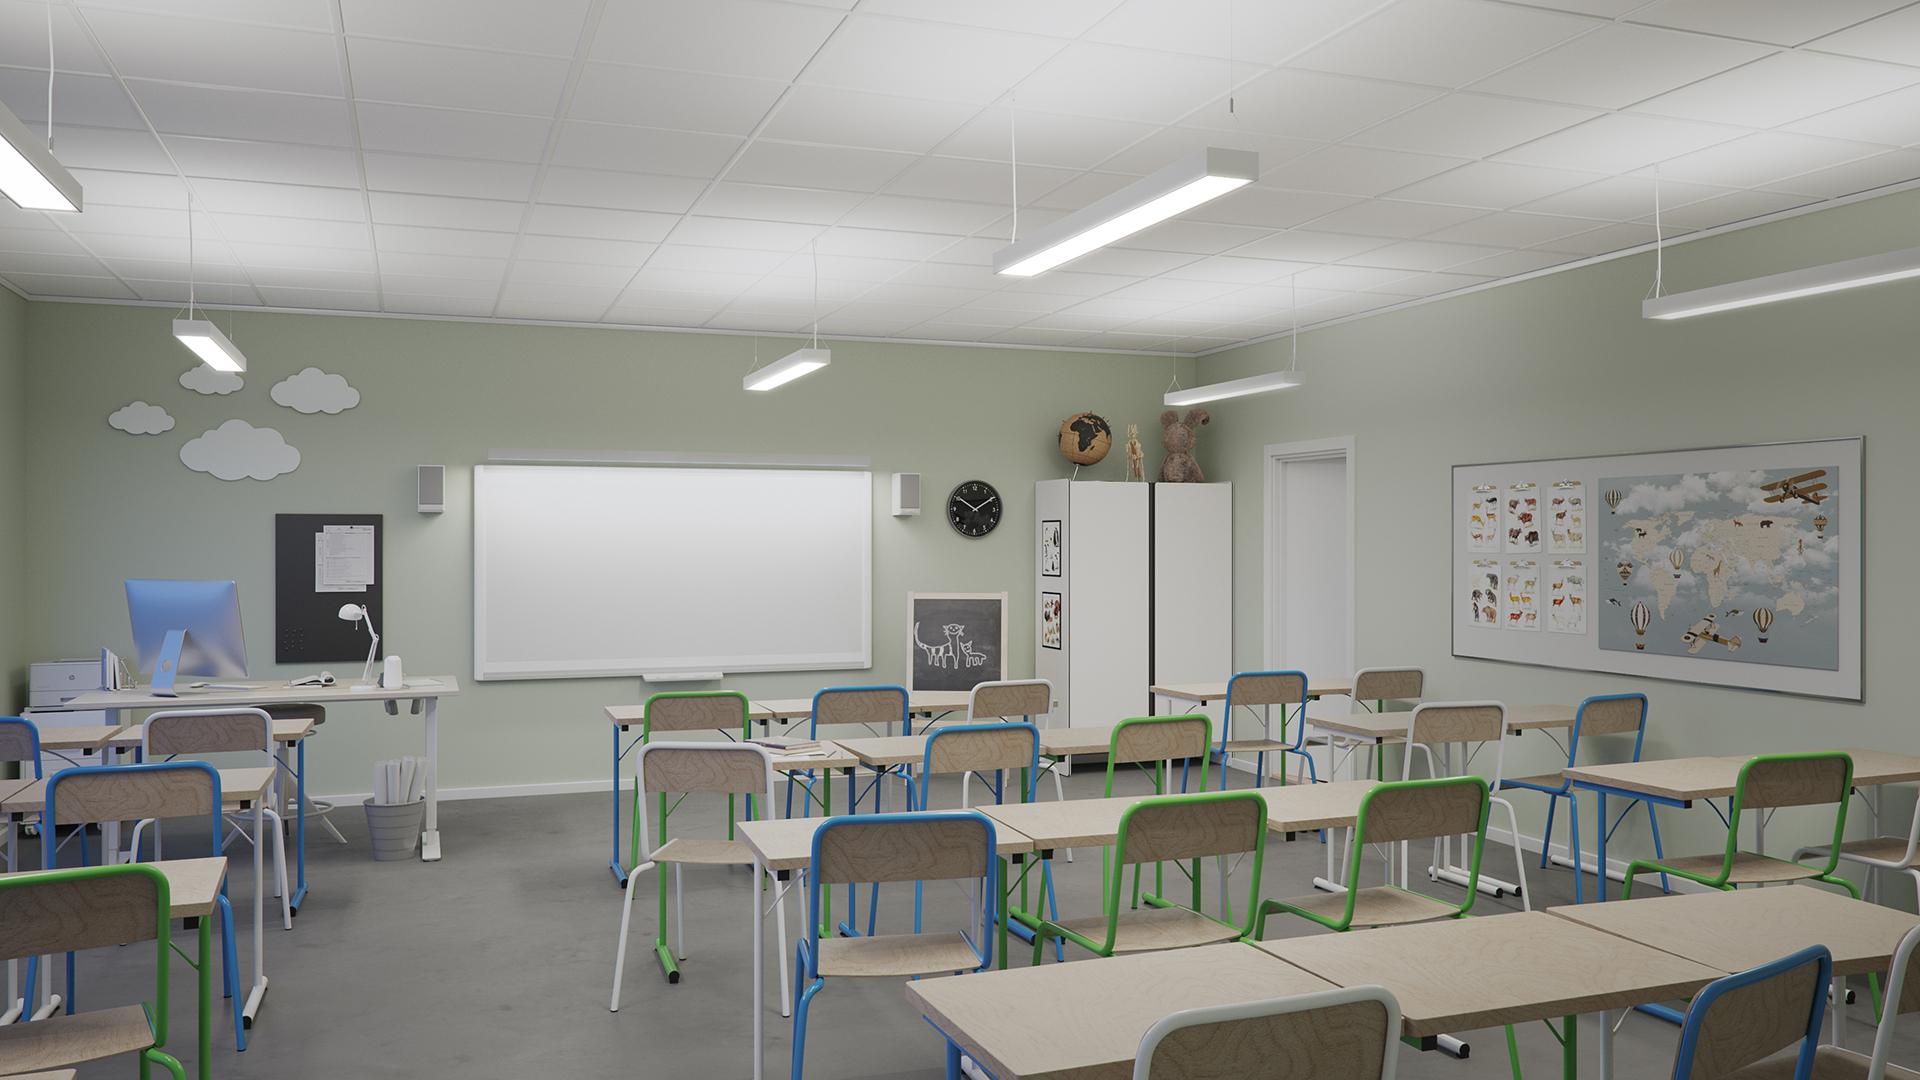 Klassrum belysning med pendlade armaturer.